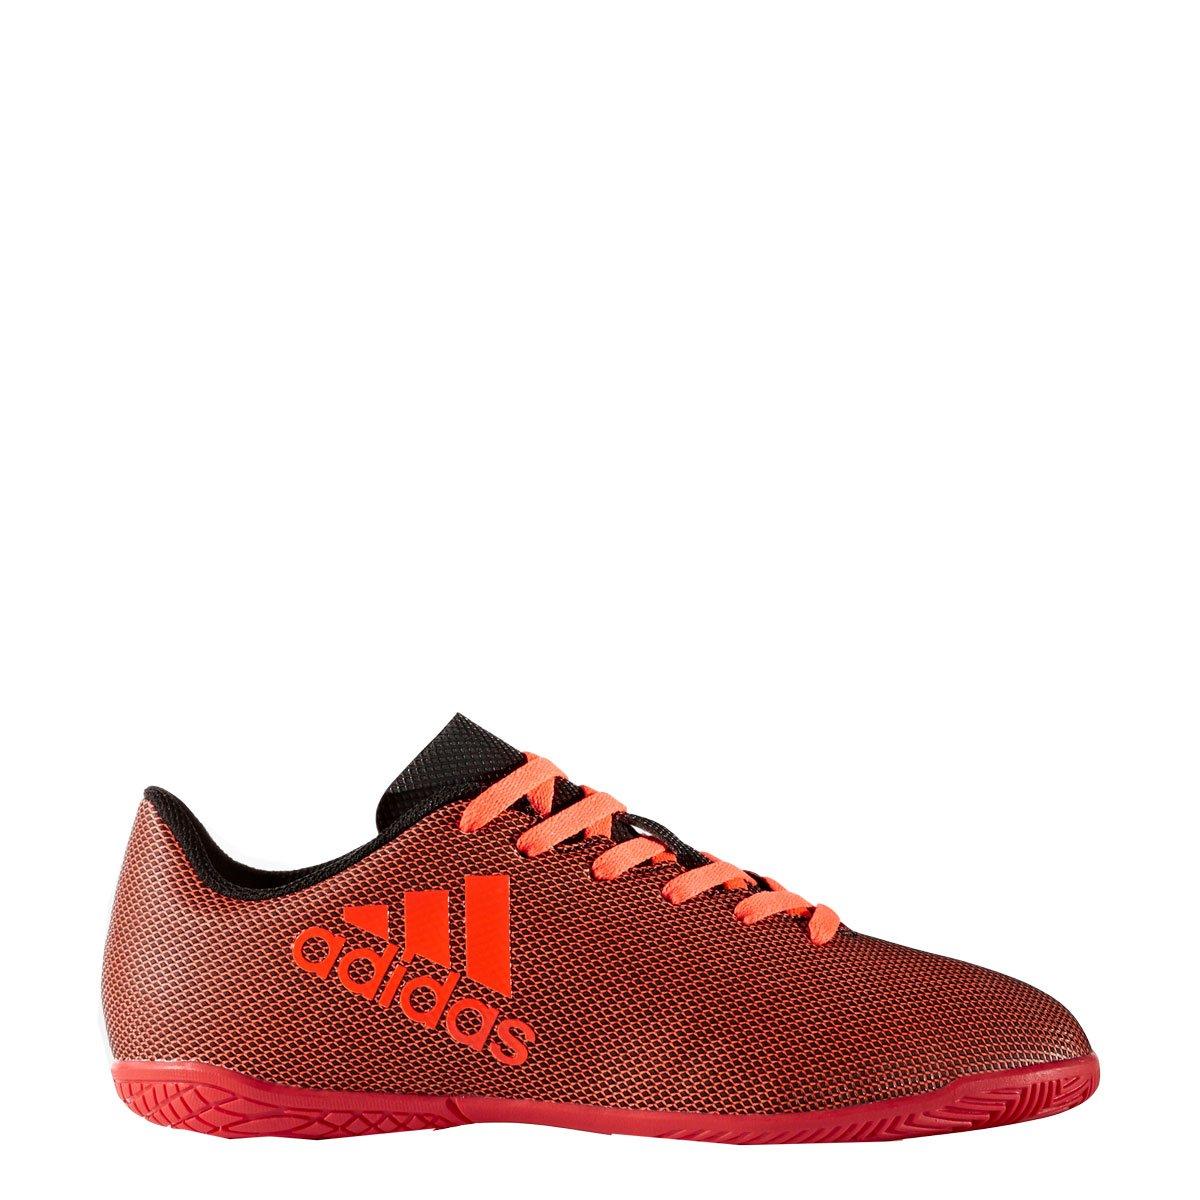 c40dc08943 Bizz Store - Chuteira Infantil Futsal Adidas X 17.4 JR